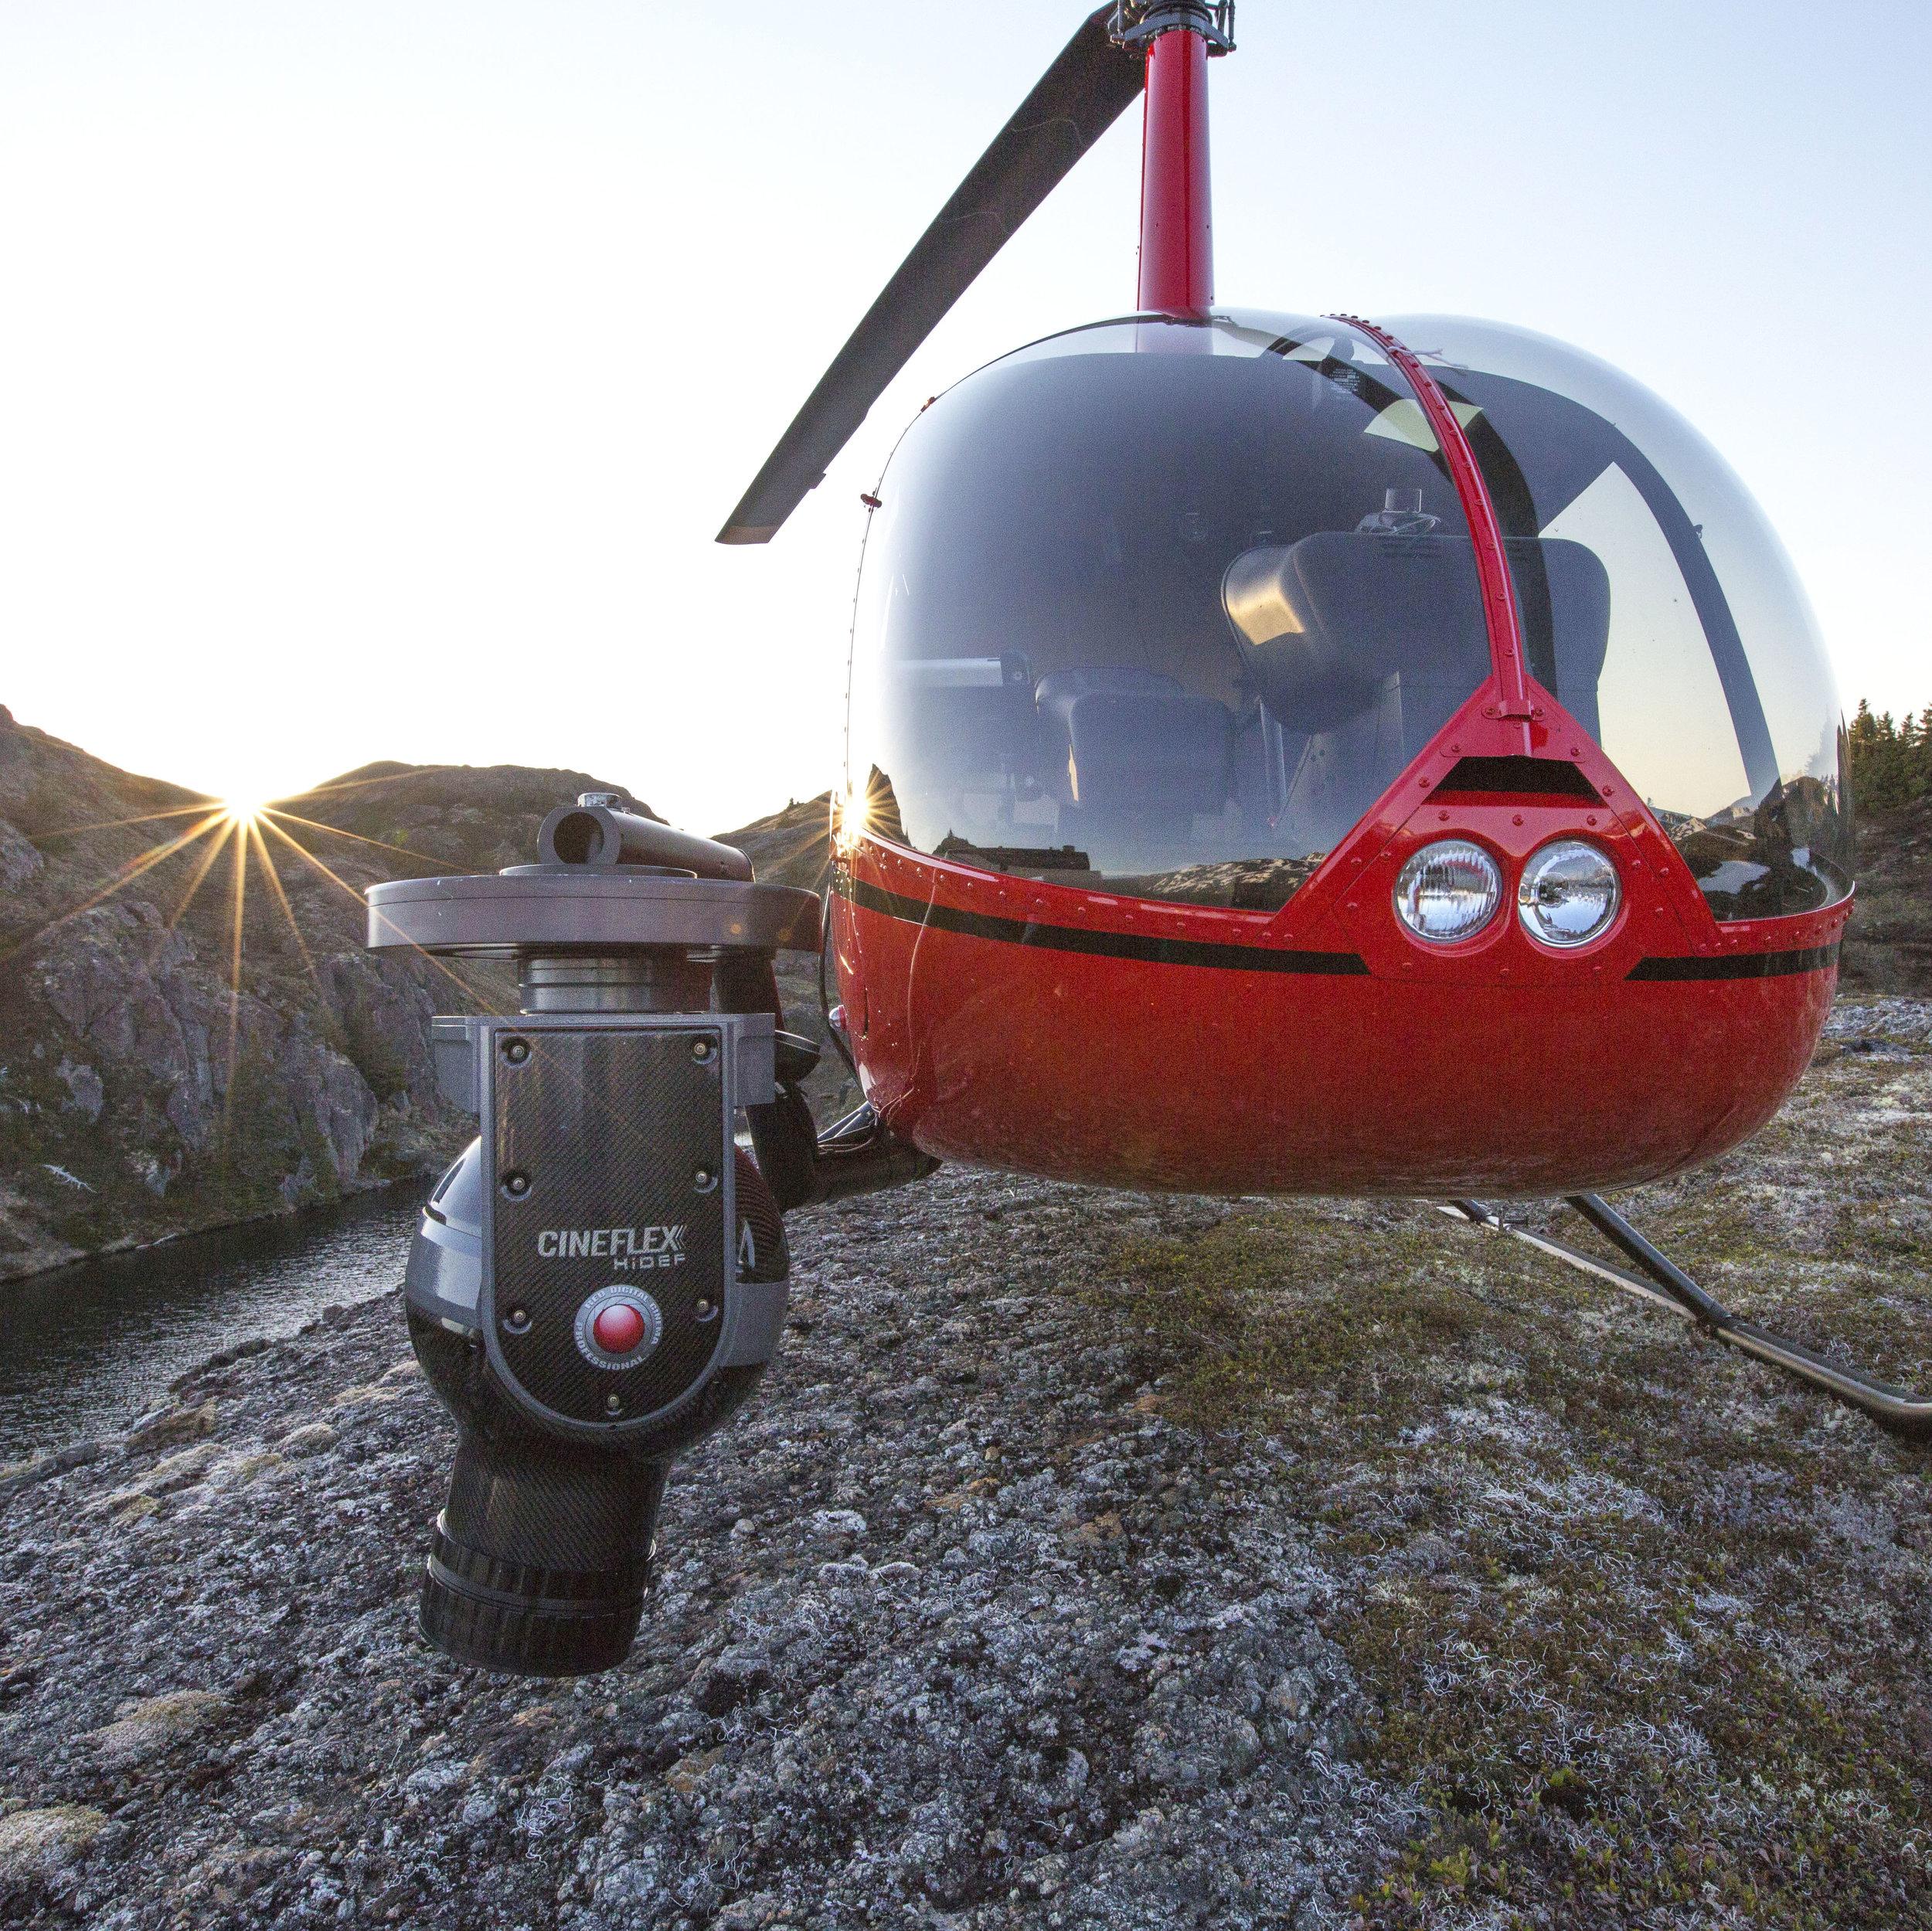 R66 Helicopter with Cineflex Gimbal - Zatzworks Aerial Video